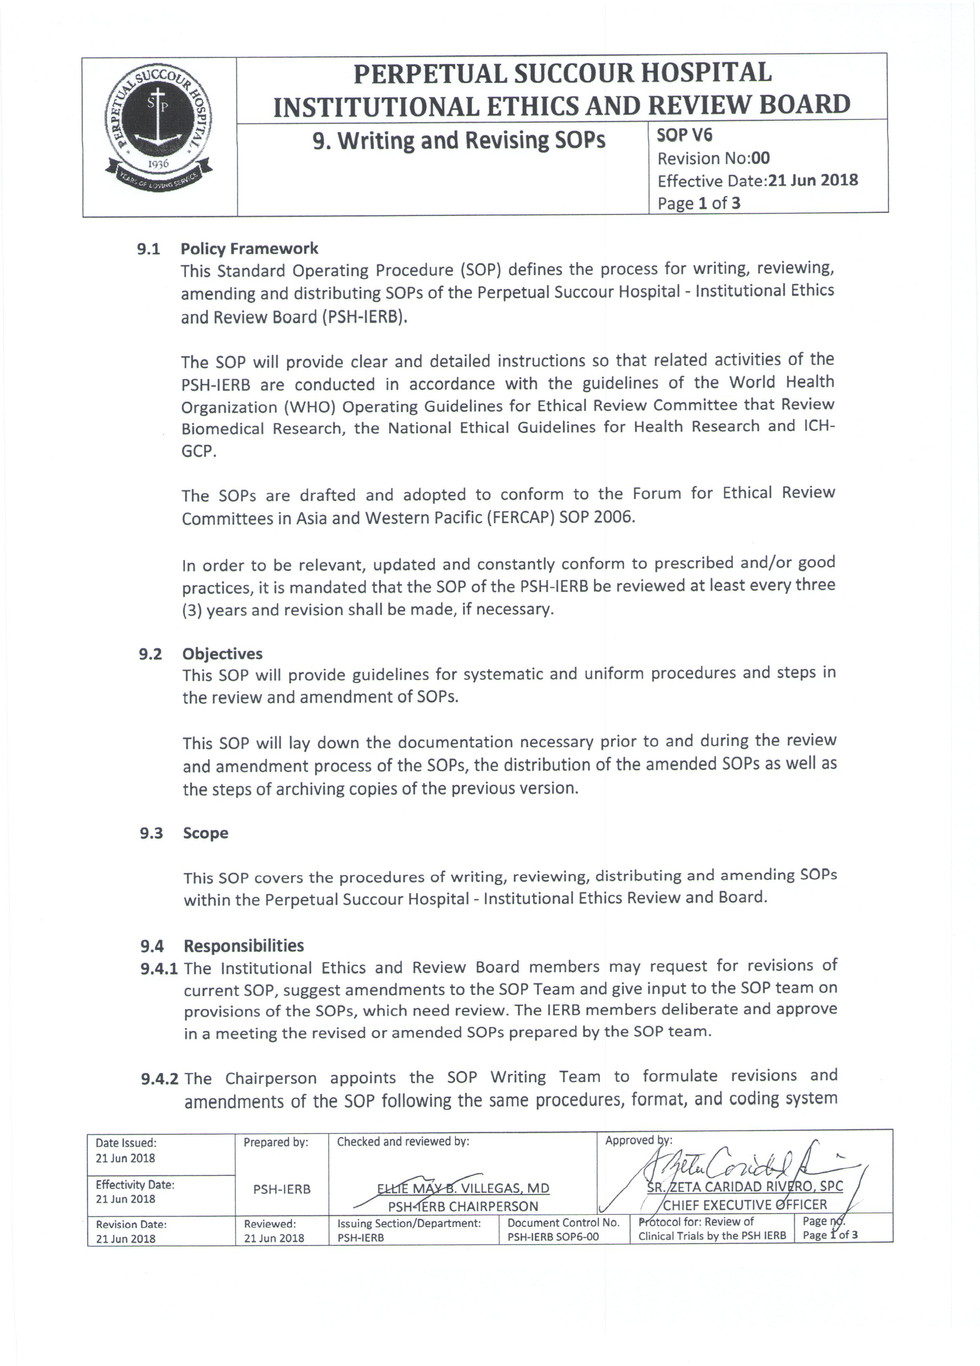 Writing and Revising SOPs 1.jpg